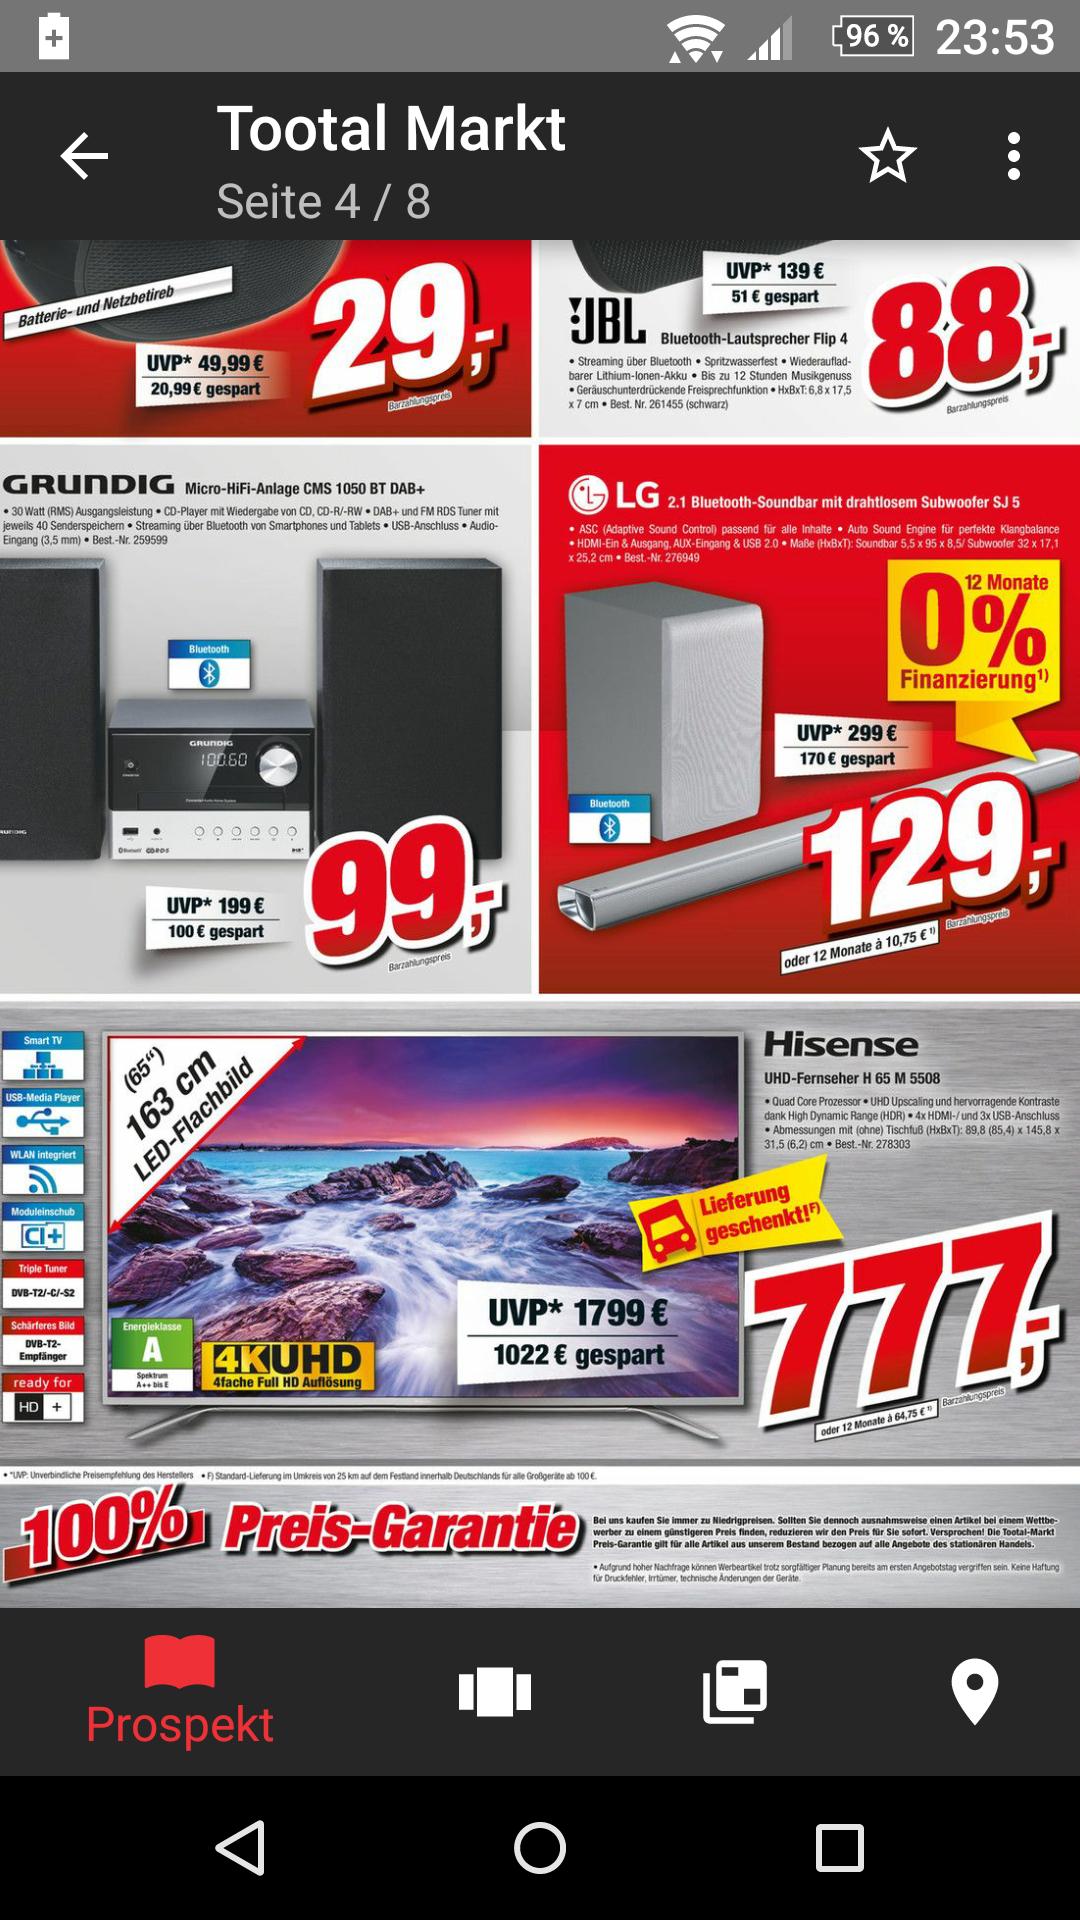 Lokal TootalMarkt Vechta Wieder zum Bestpreis!Hisense H65M5508 UHD TV (65'' UHD Edge-lit HDR, 1000Hz [interpol.], Triple Tuner, 4x HDMI, 3x USB, Smart TV, VESA